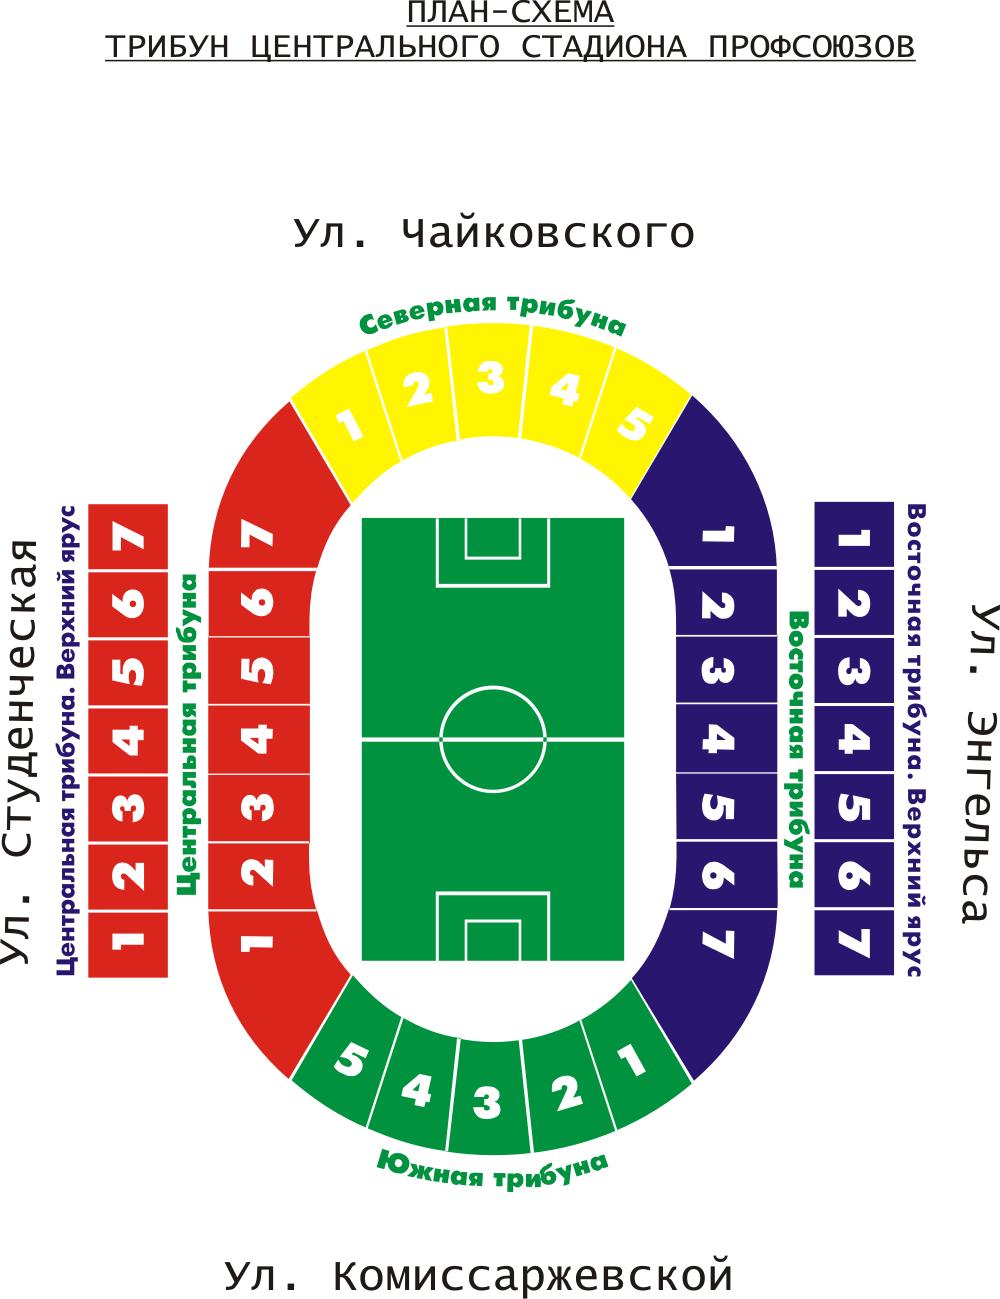 Стадион астрахань схема